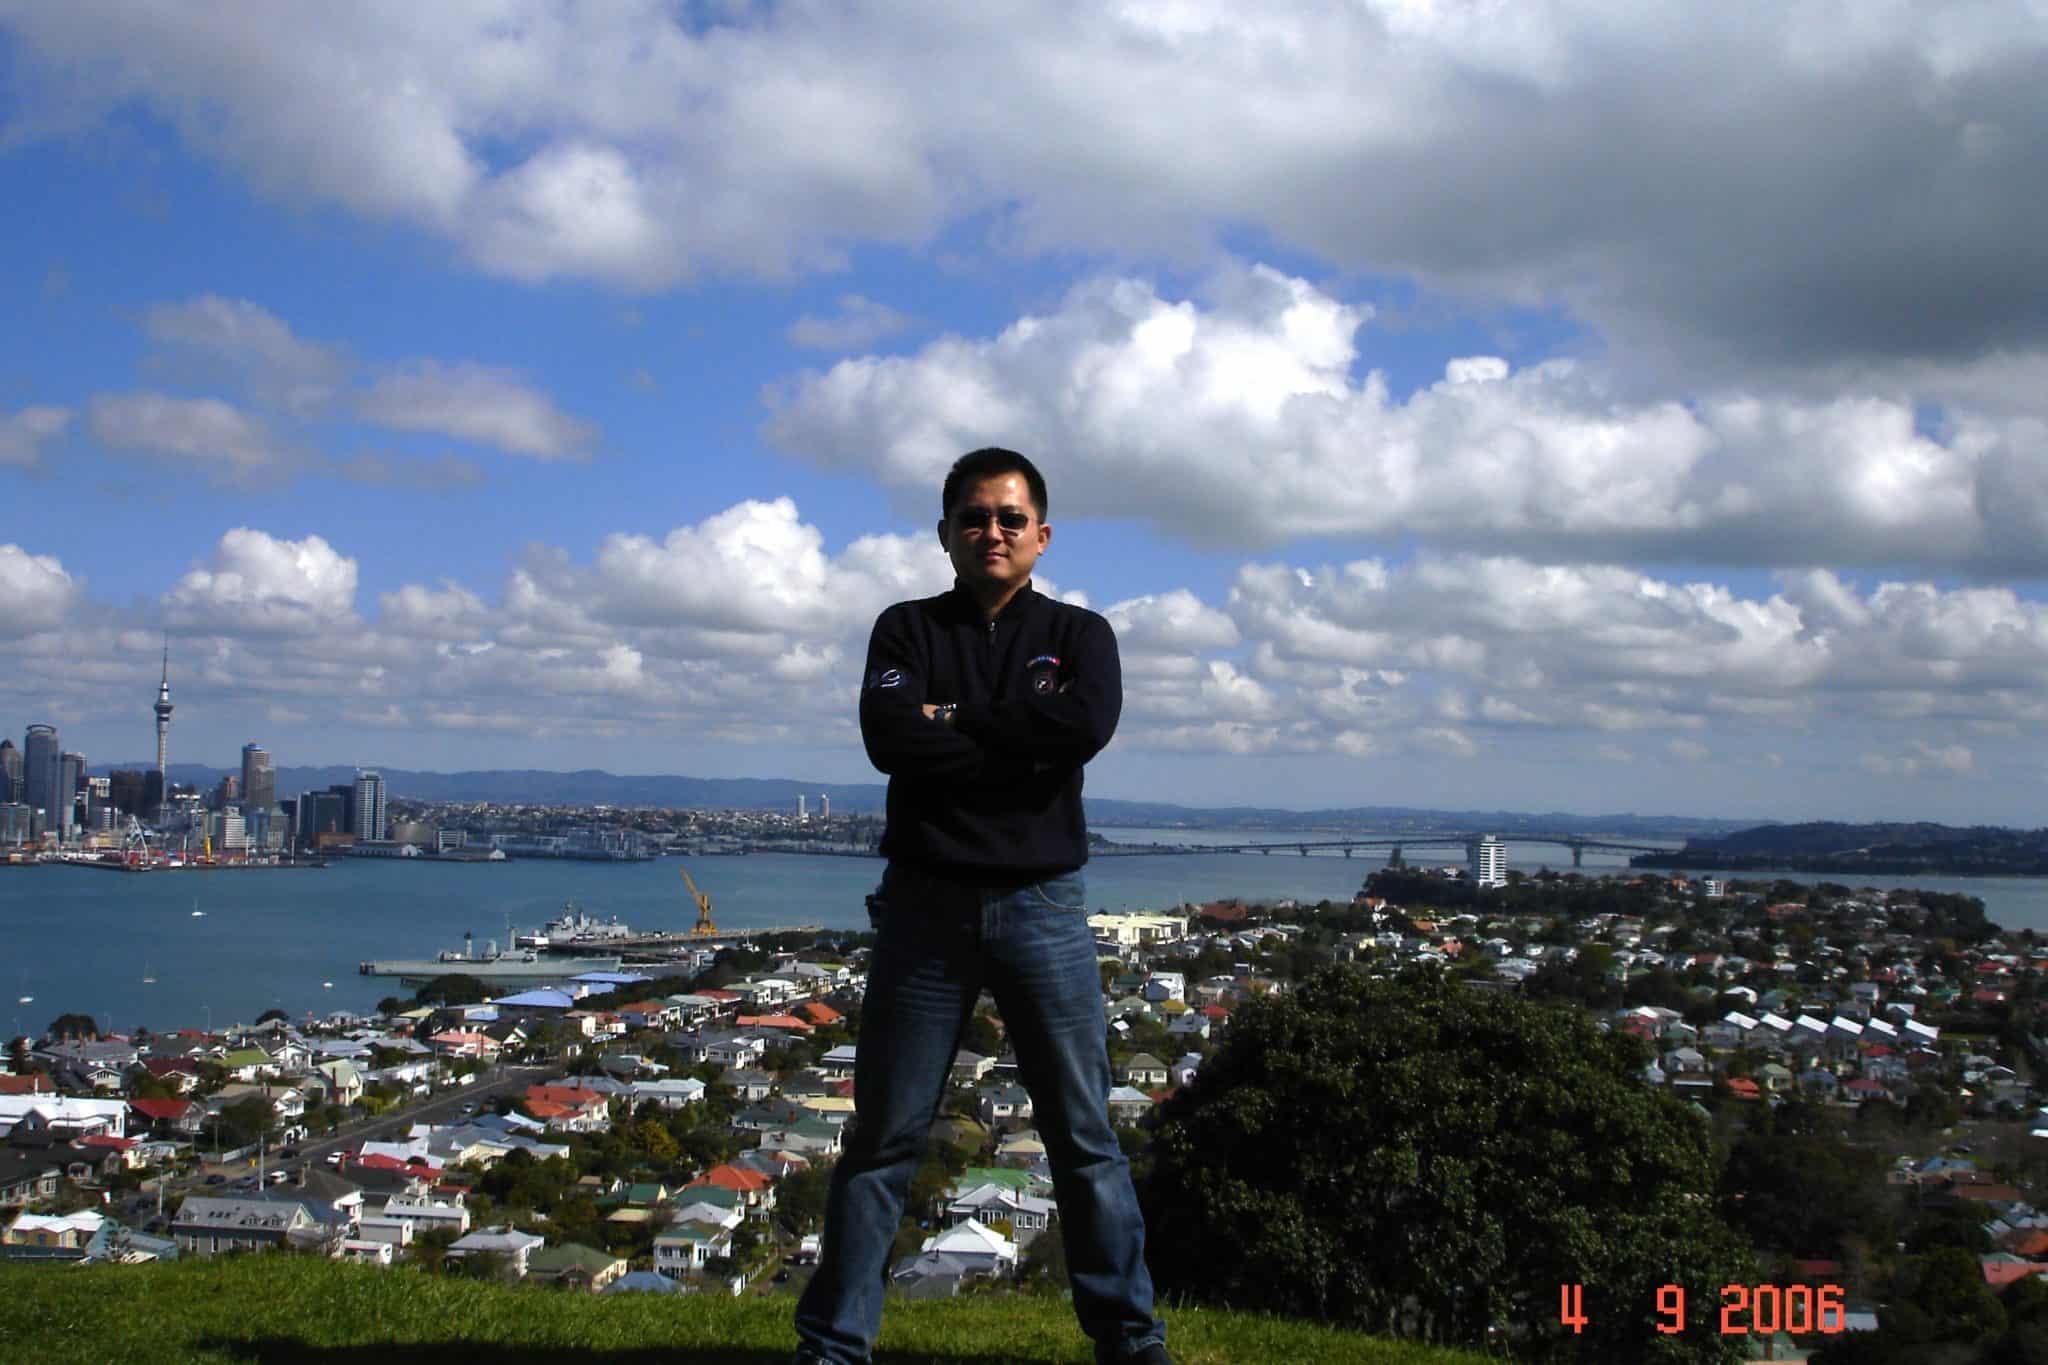 @ North Shore Auckland